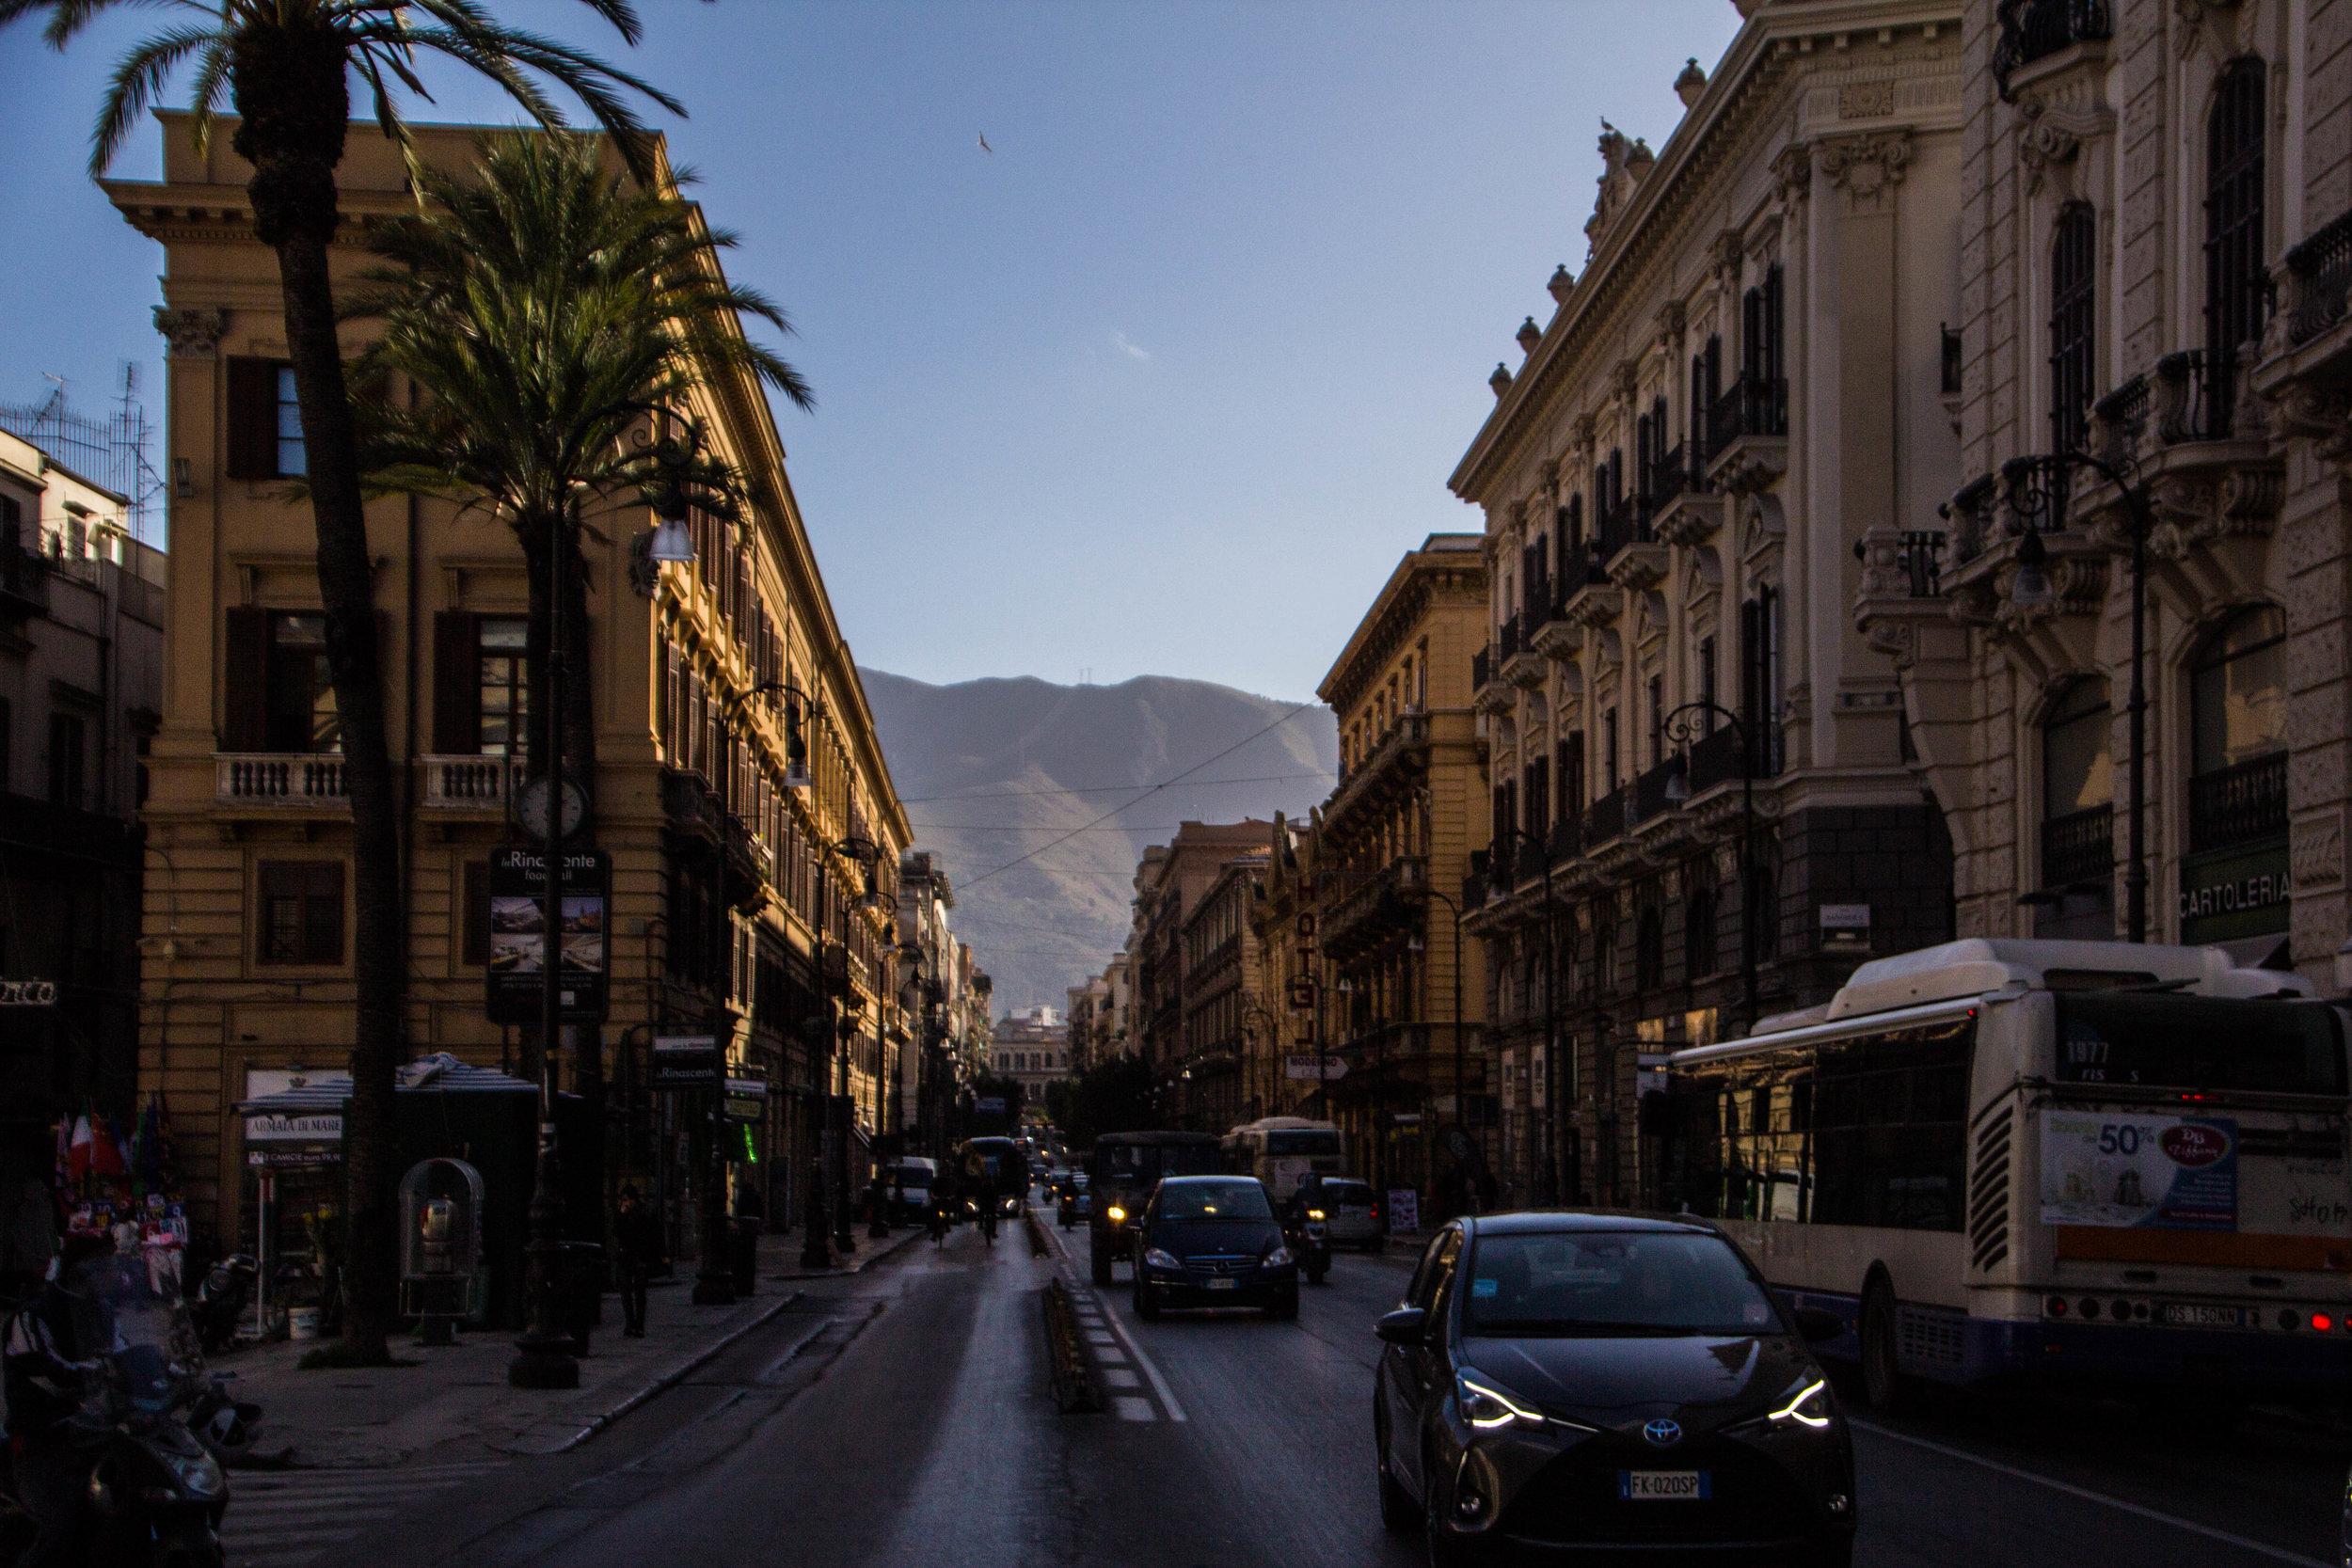 streets-palermo-sicily-4.jpg